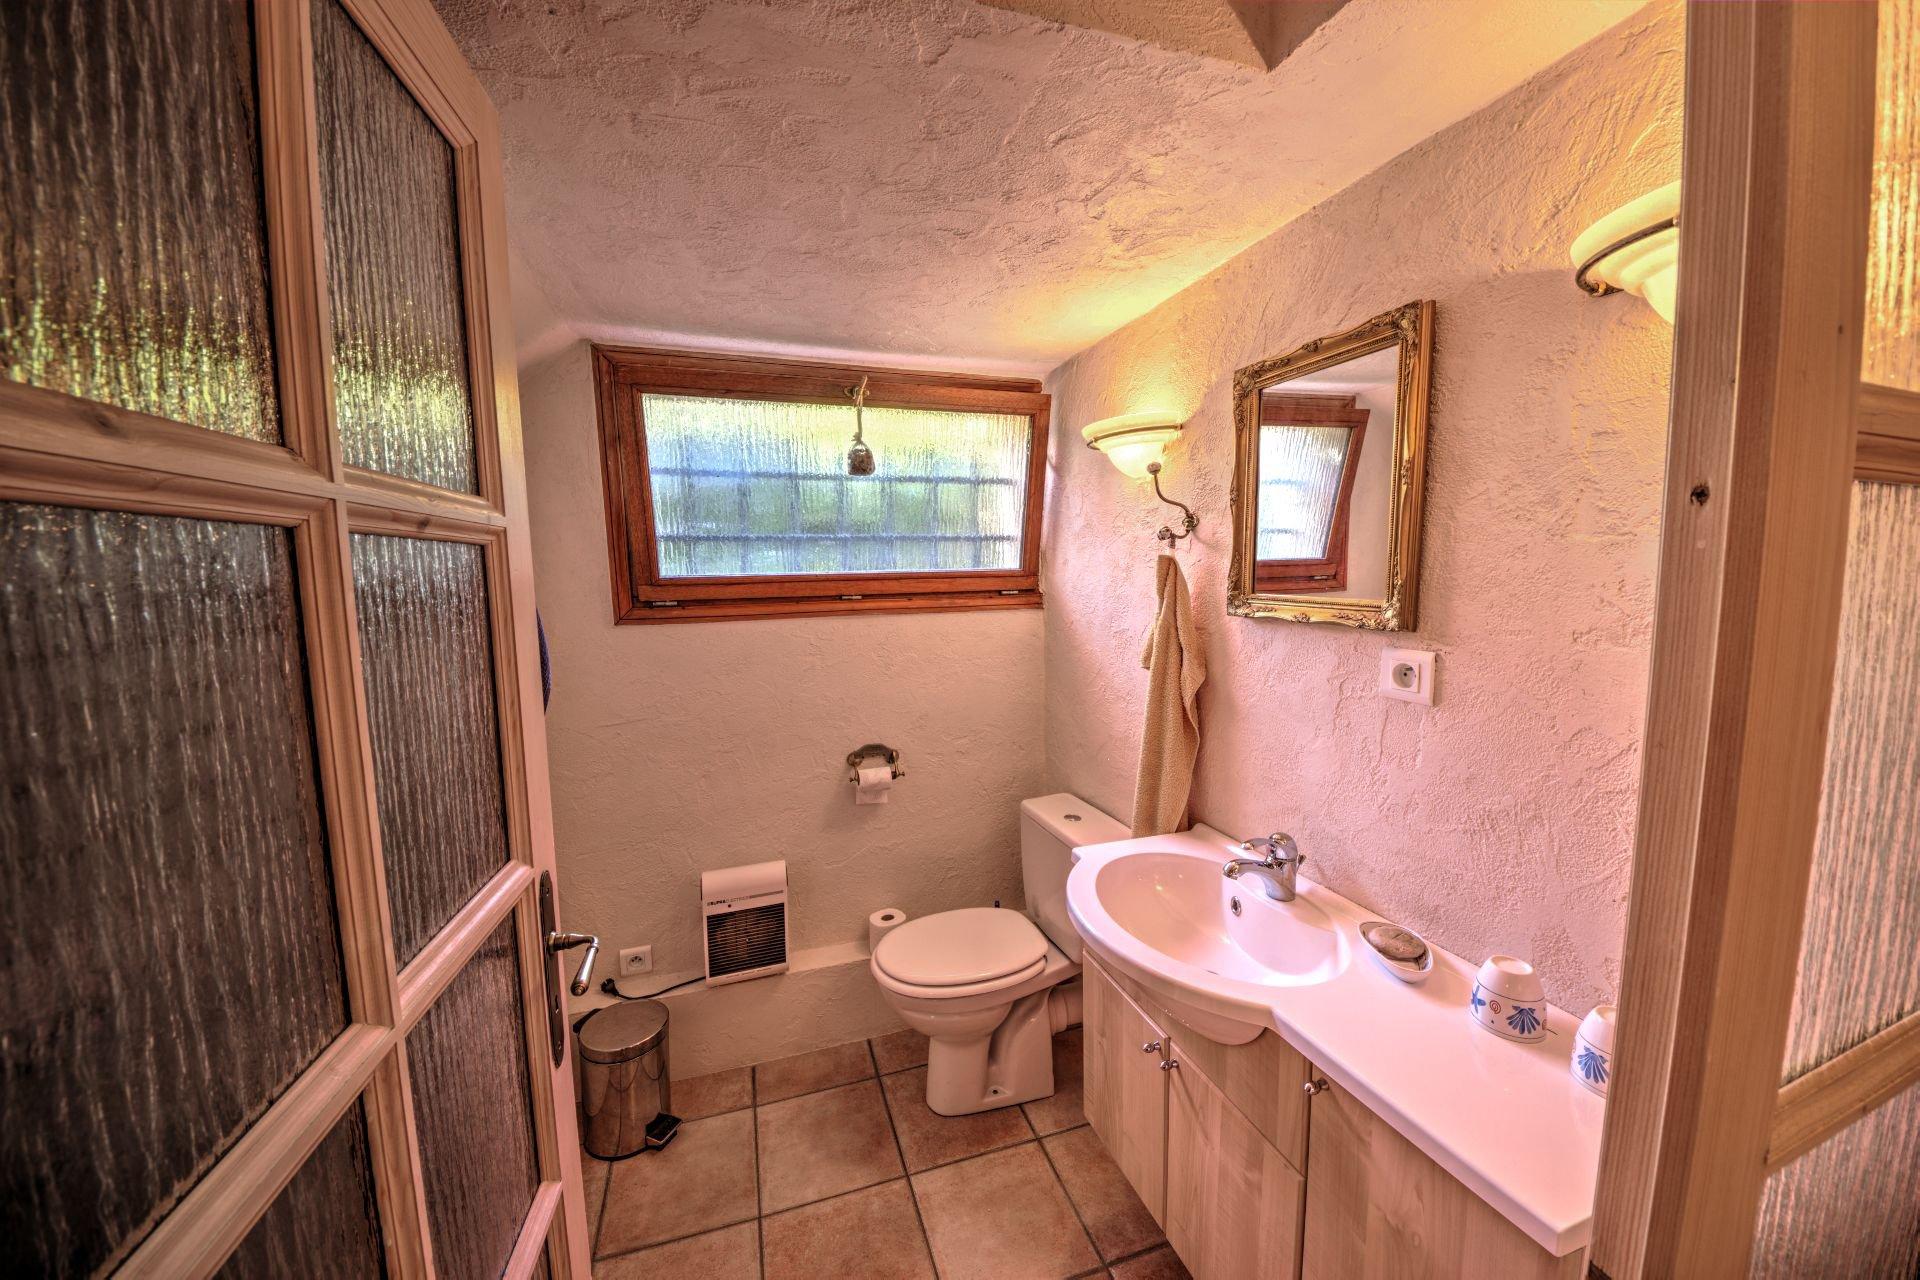 Bathroom ground floor of Beautiful villa of 180 sqm, three bedrooms, swimming pool, on 4000 m² closed, Tourtour, Var, Provence